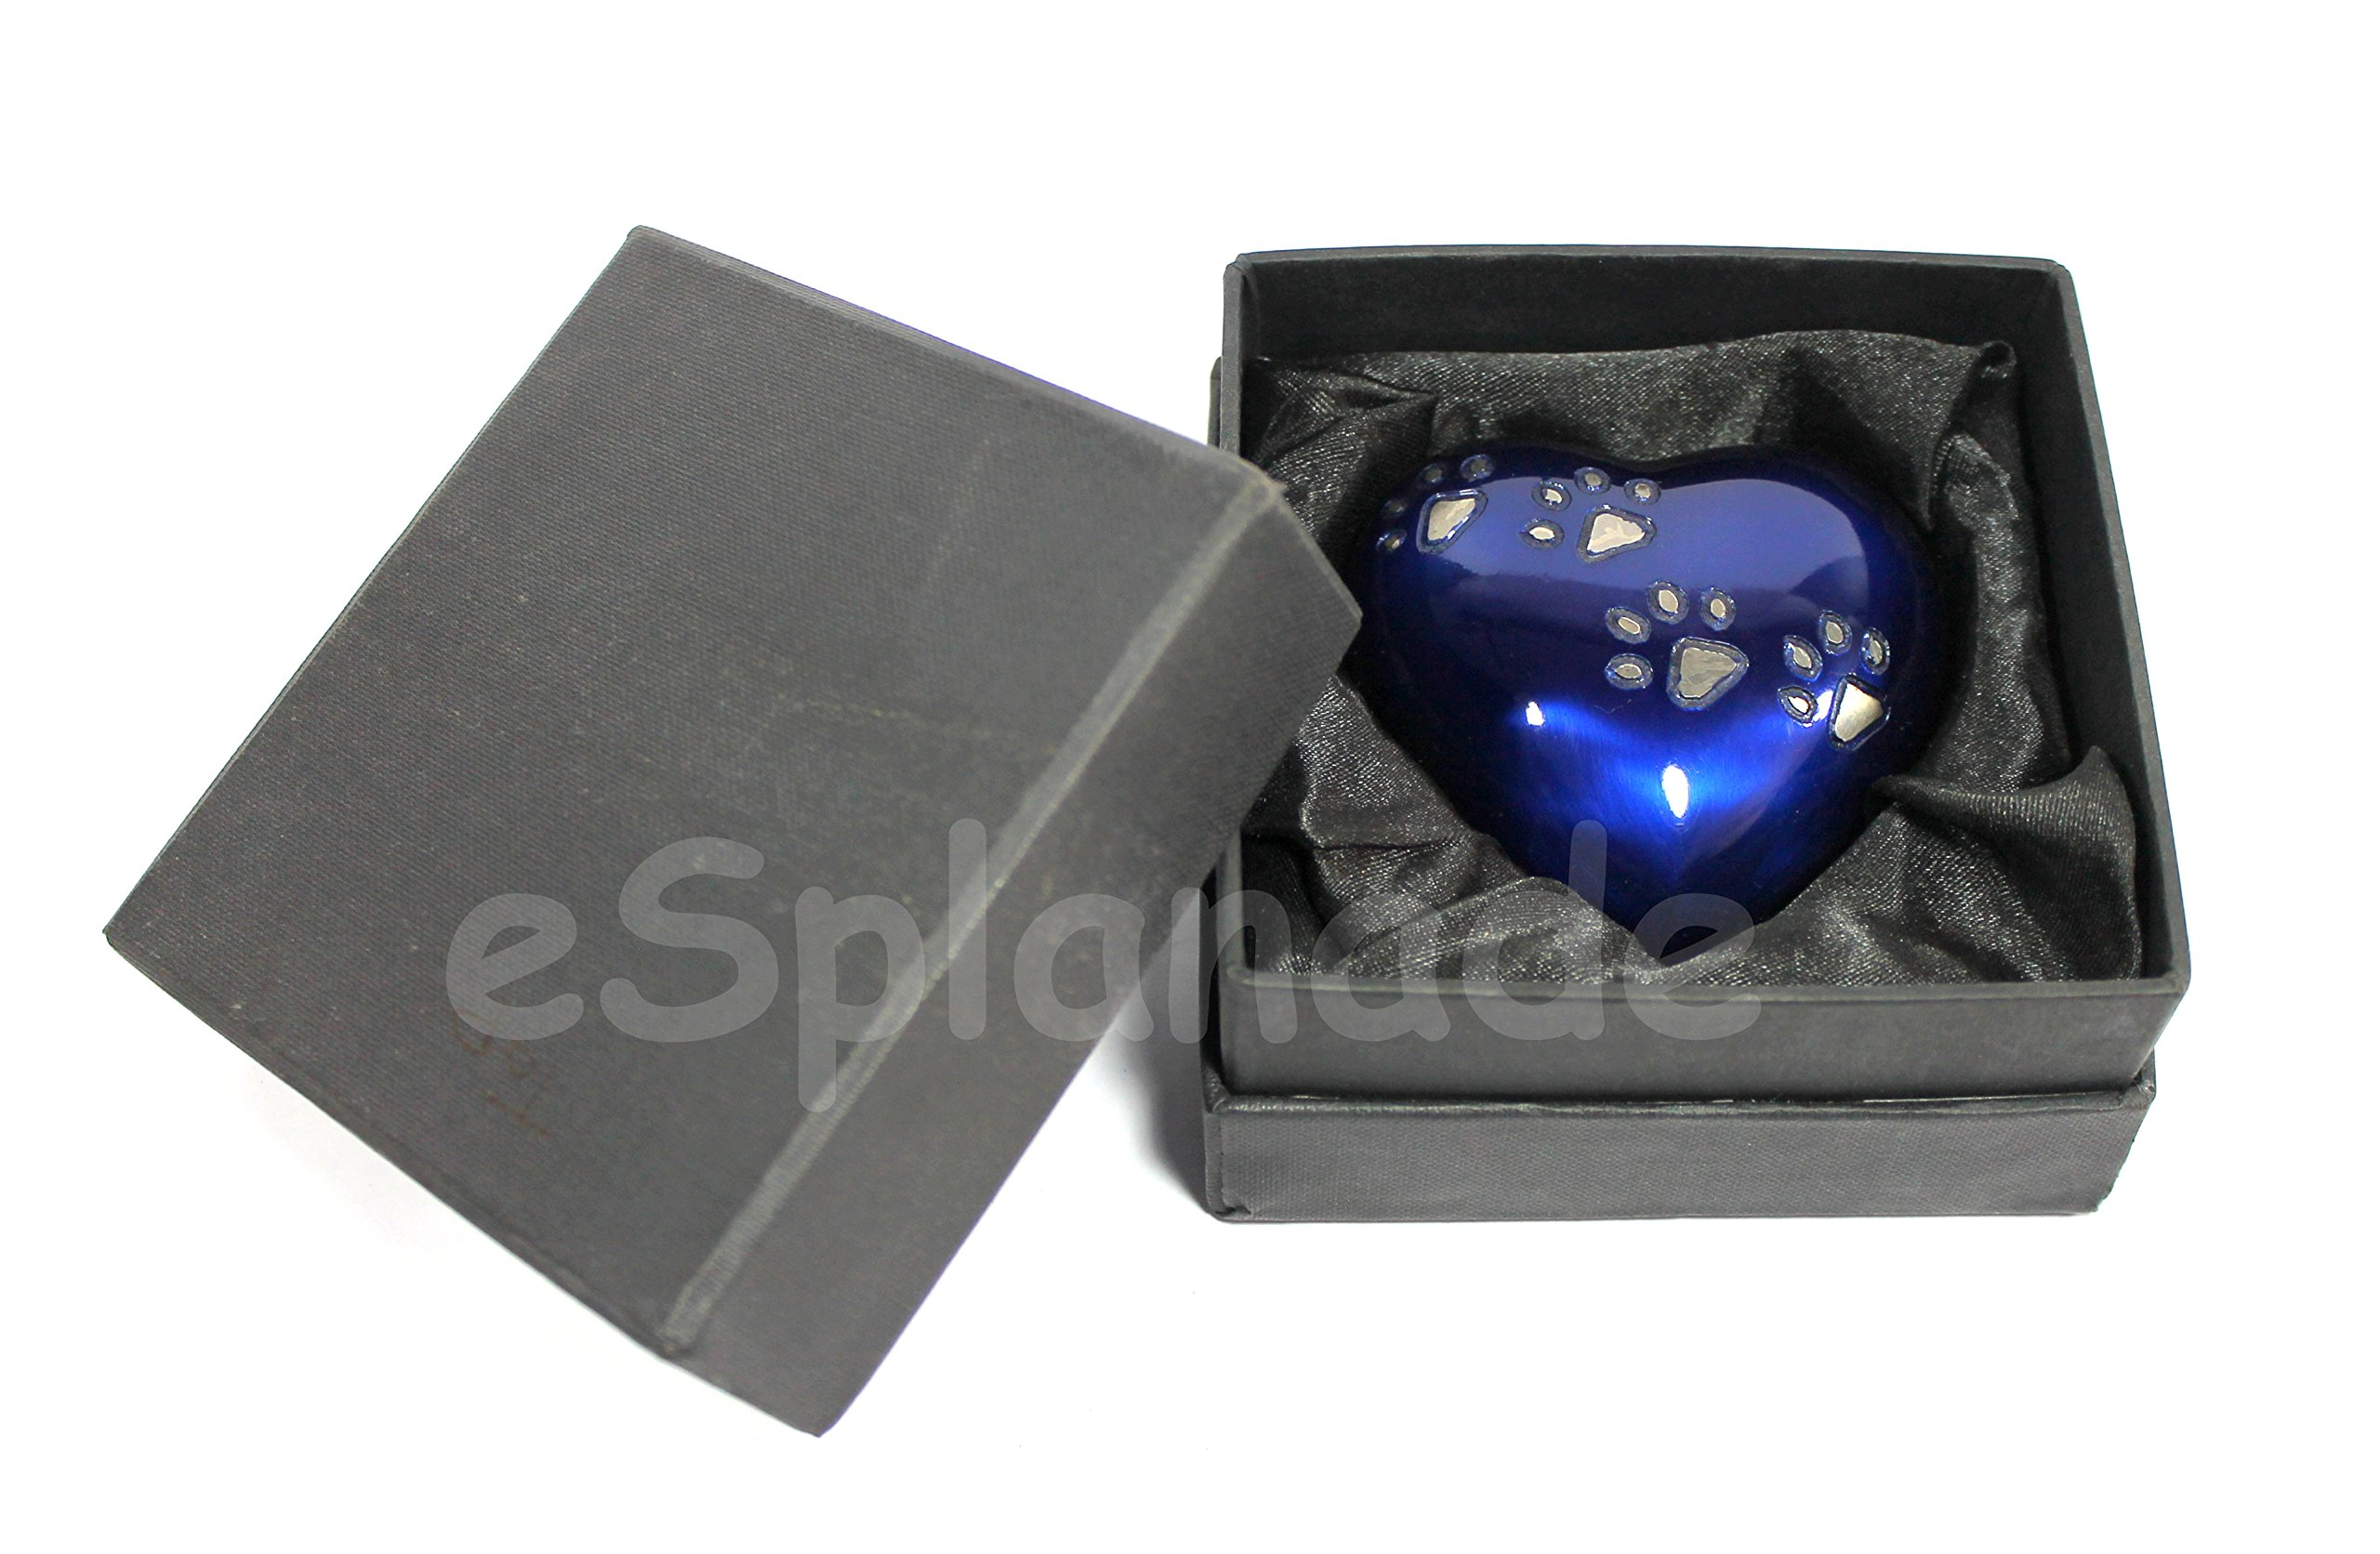 eSplanade Heart Shaped Urn Stand Memorial Keepsake Urns. Burial Urns Stand for Heart Keepsake Urn Metal Urns